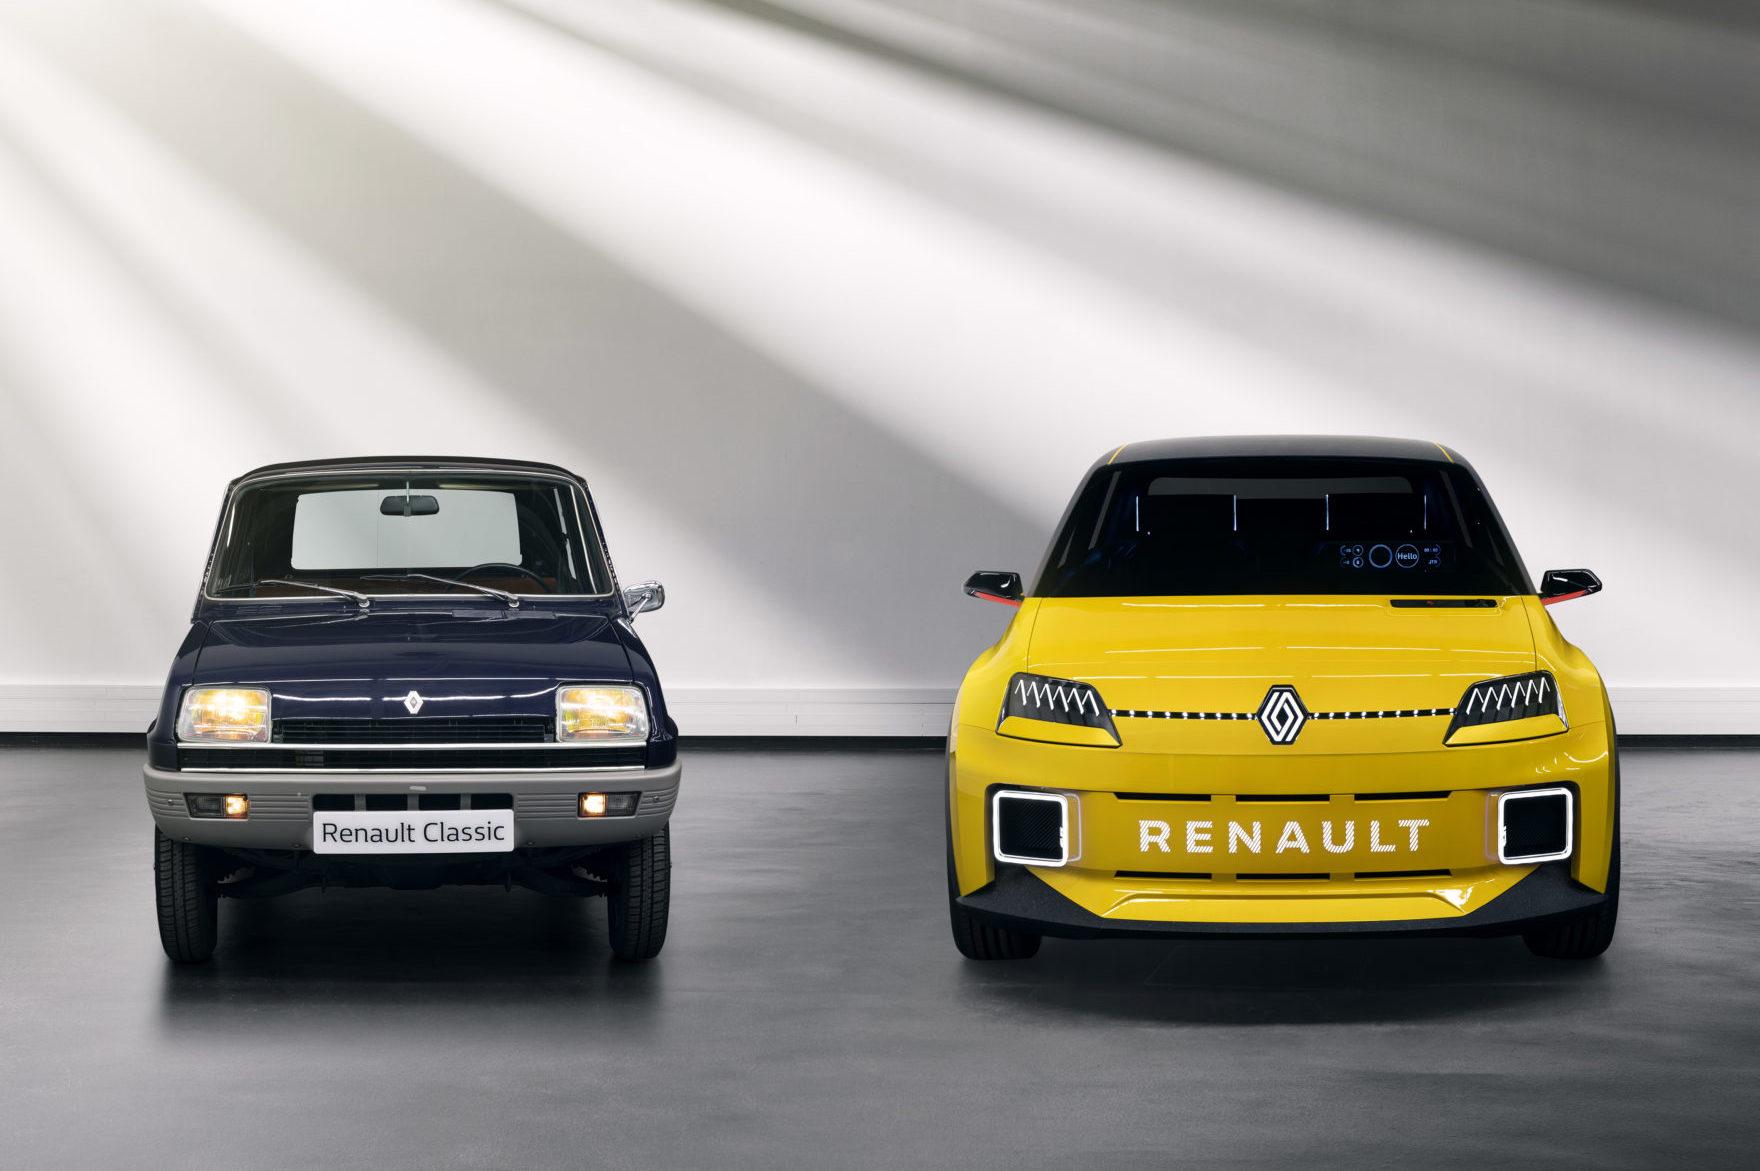 Renault 5 e Renault 5 Prototype